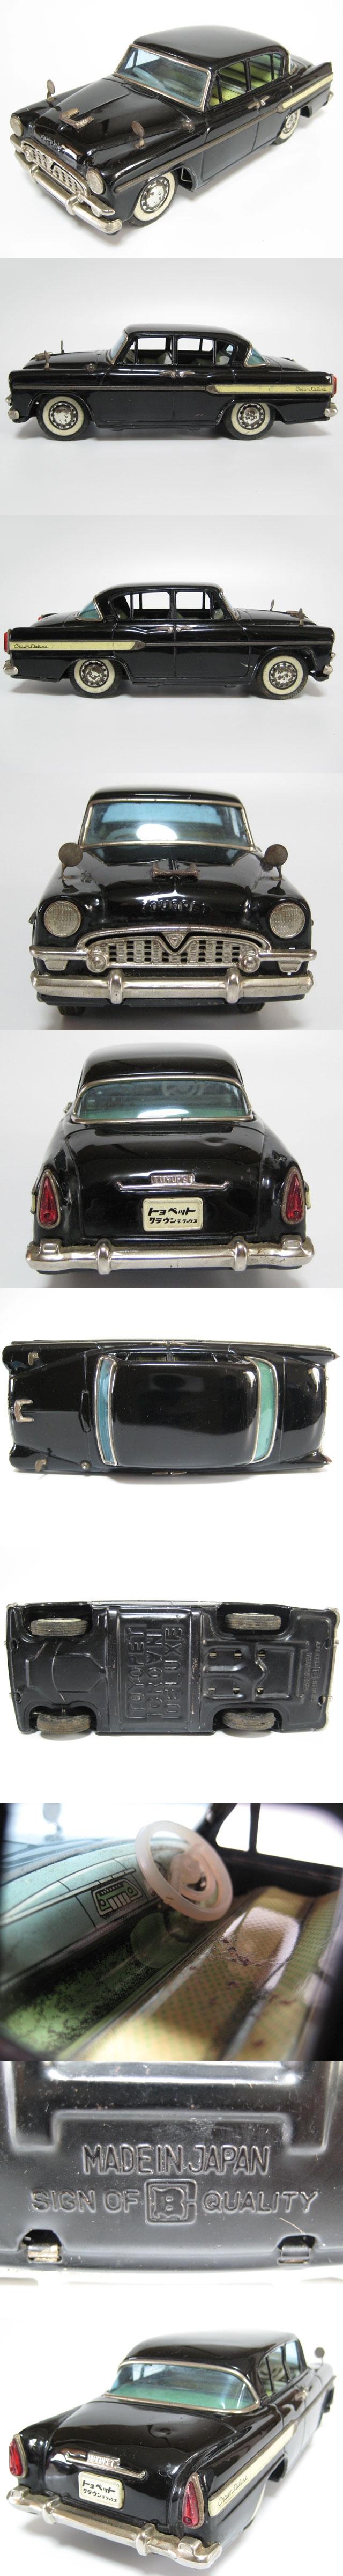 bandai tin toyota crown s30 1960 - black copy